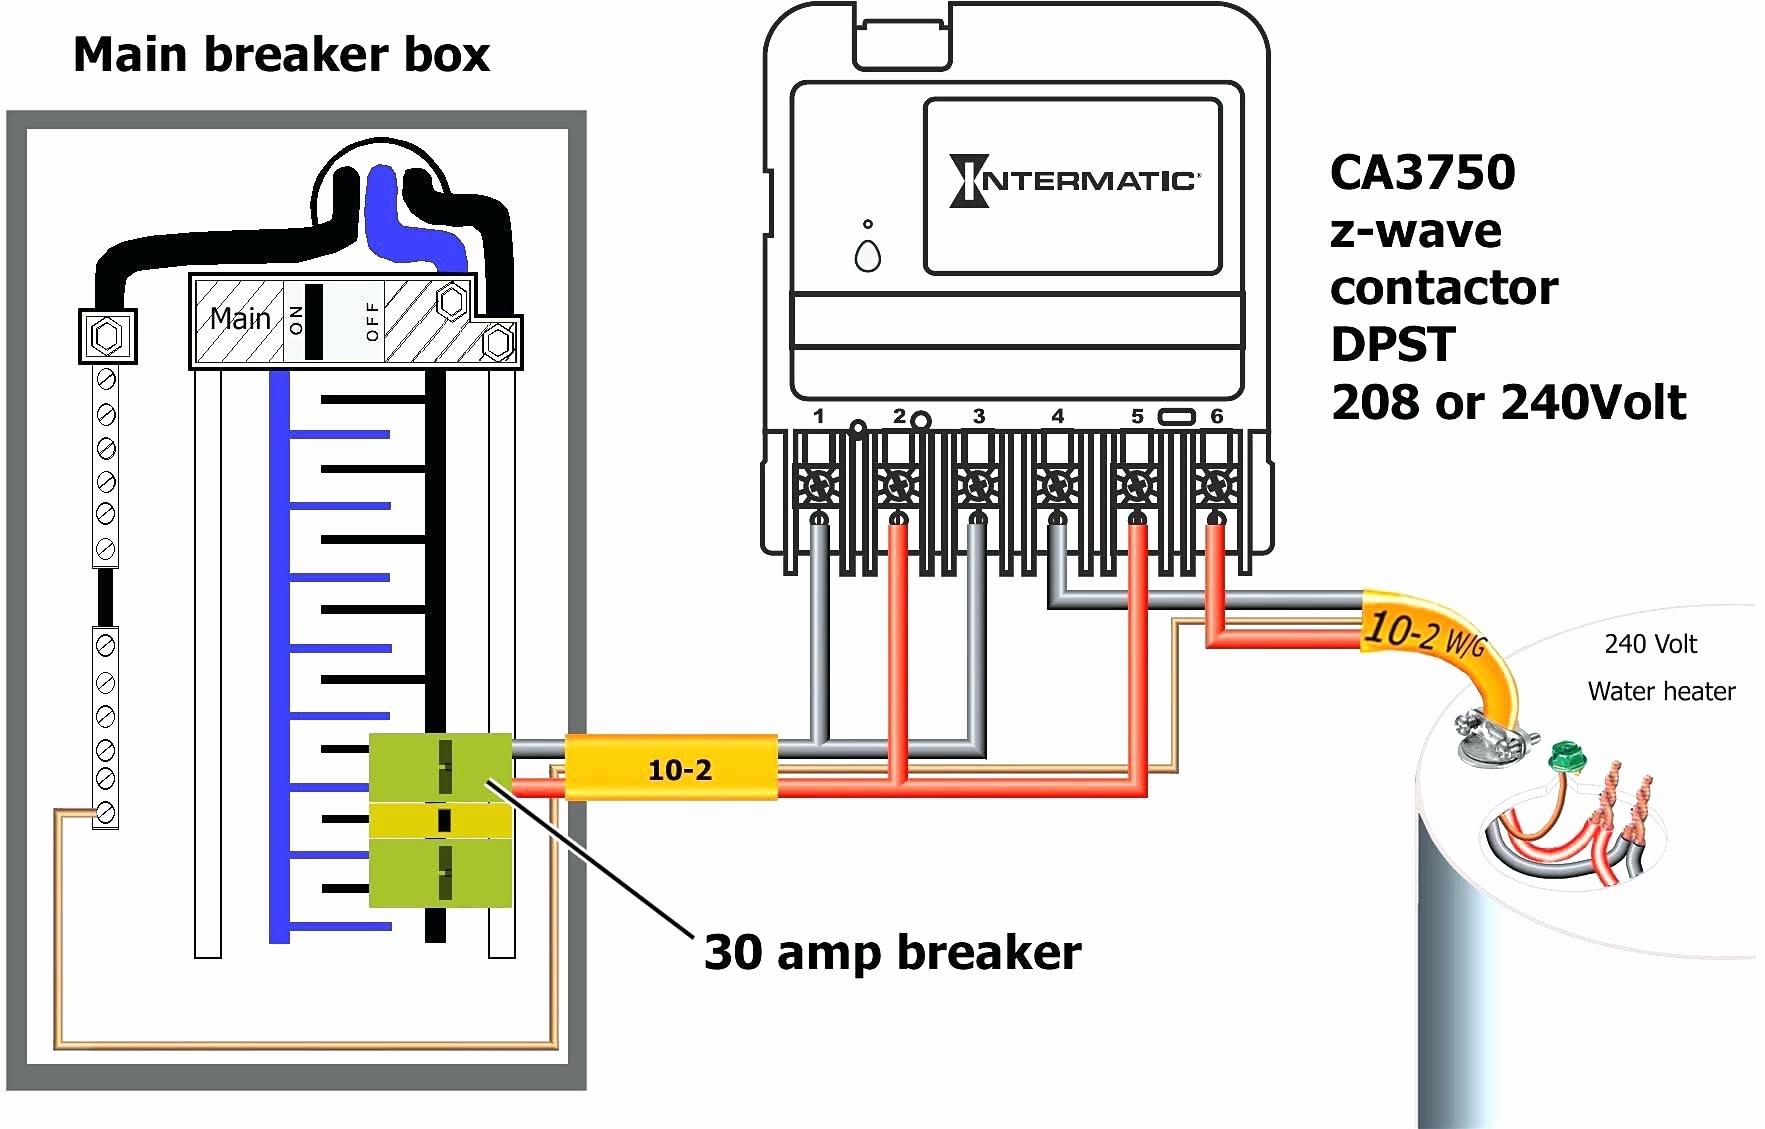 hight resolution of homeline load center hom6 12l100 wiring diagram free wiring diagramhomeline load center hom6 12l100 wiring diagram